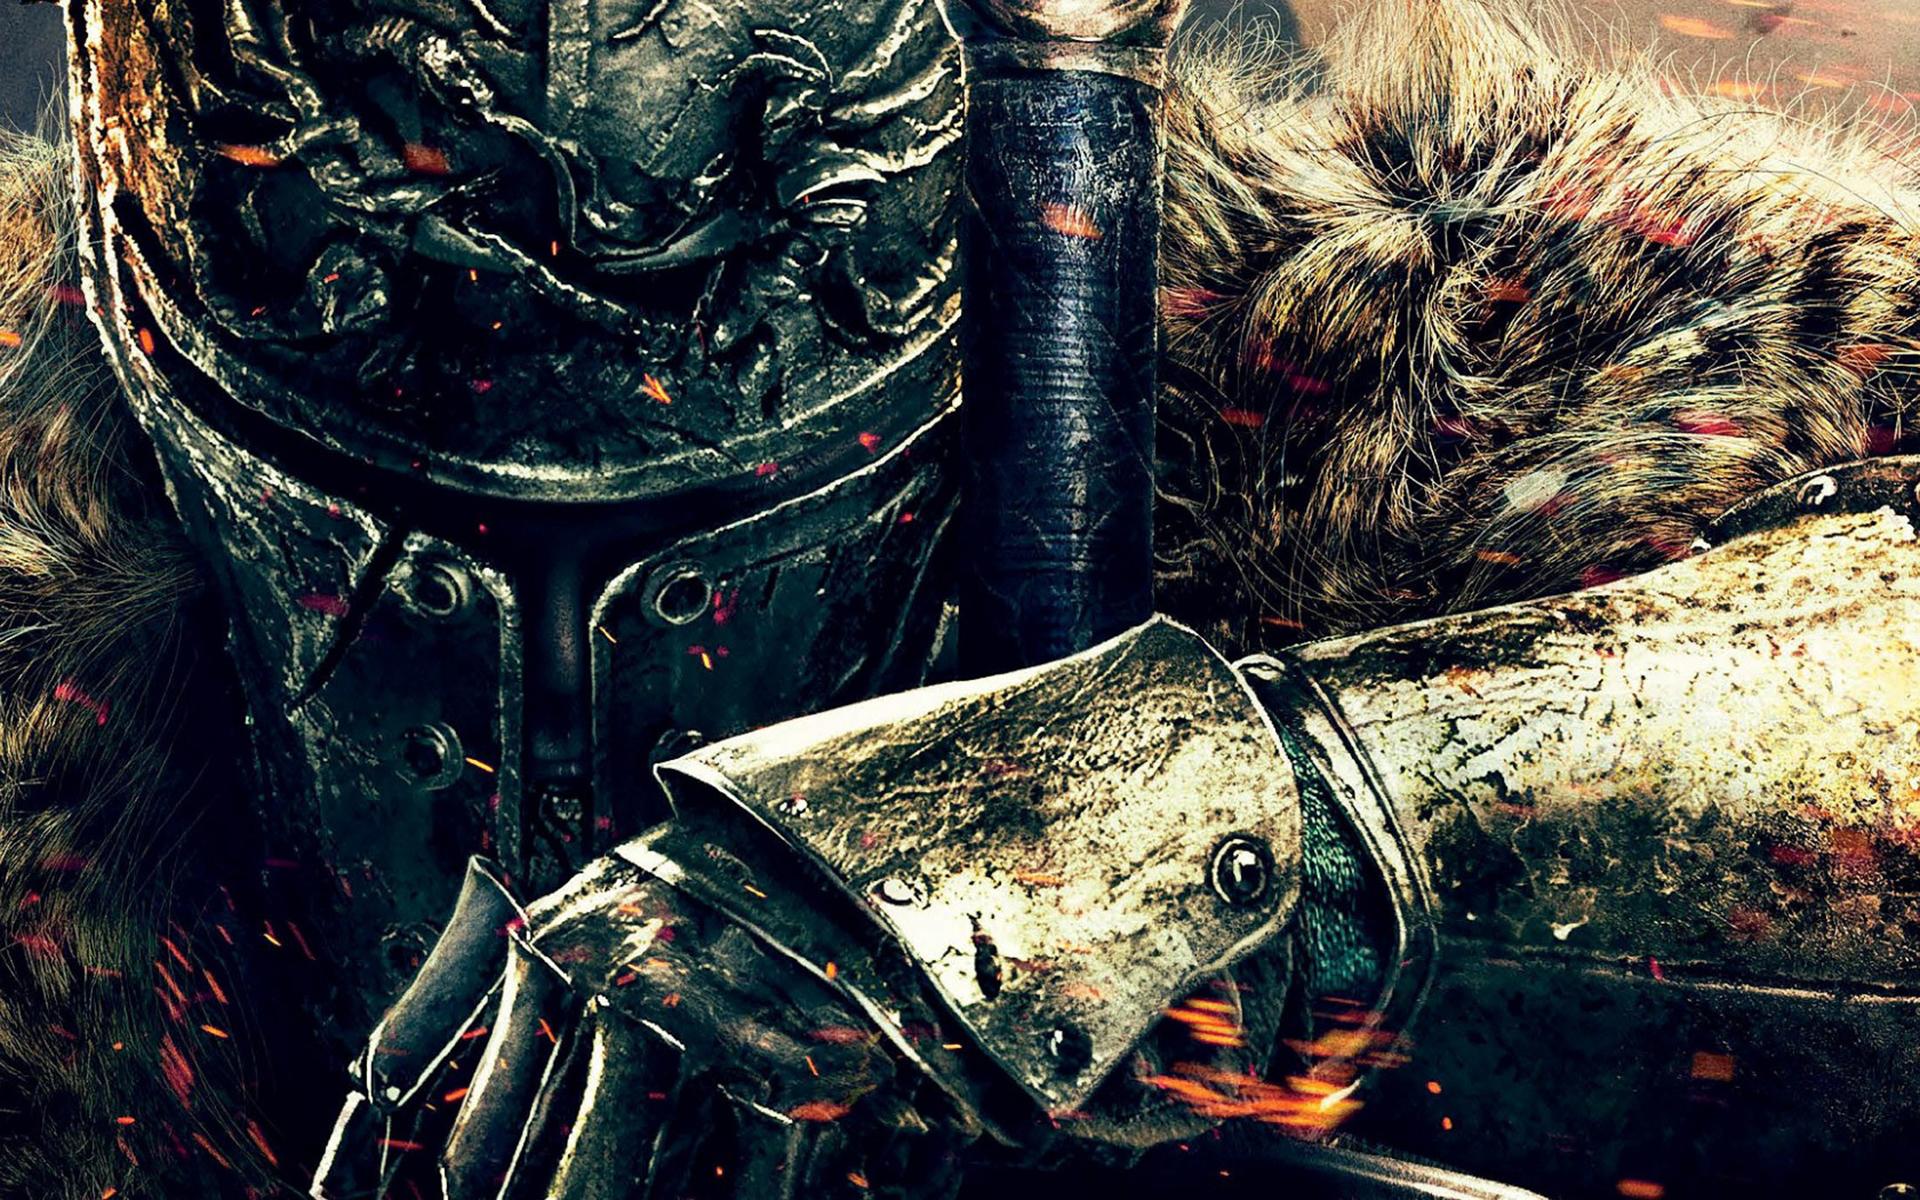 Dark Souls 2 Wallpaper: Dark Souls 2 - HD Desktop Wallpapers